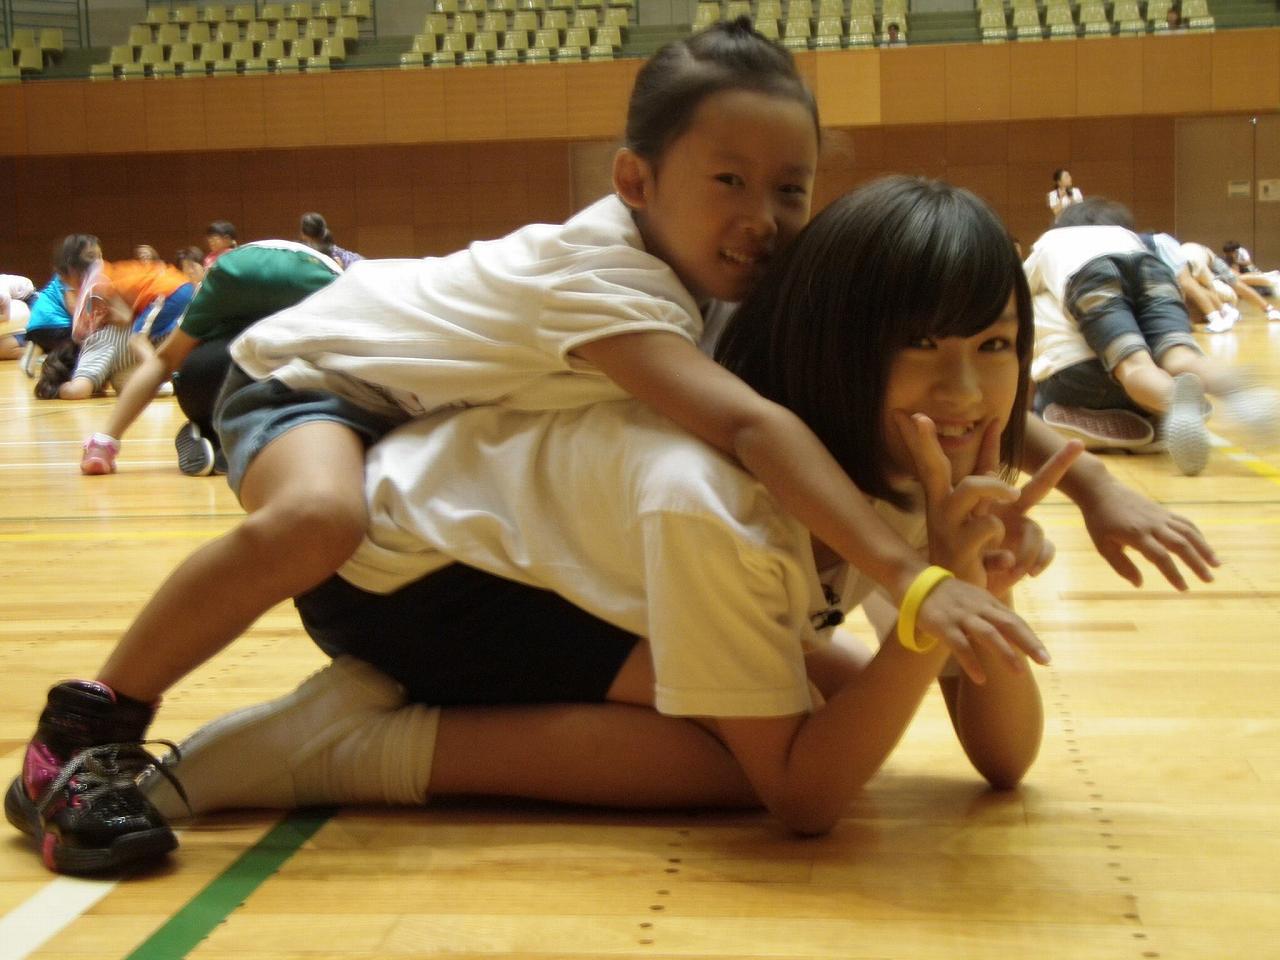 SKE48の研究生・水野愛理(12歳)がバックで突かれてる流出画像